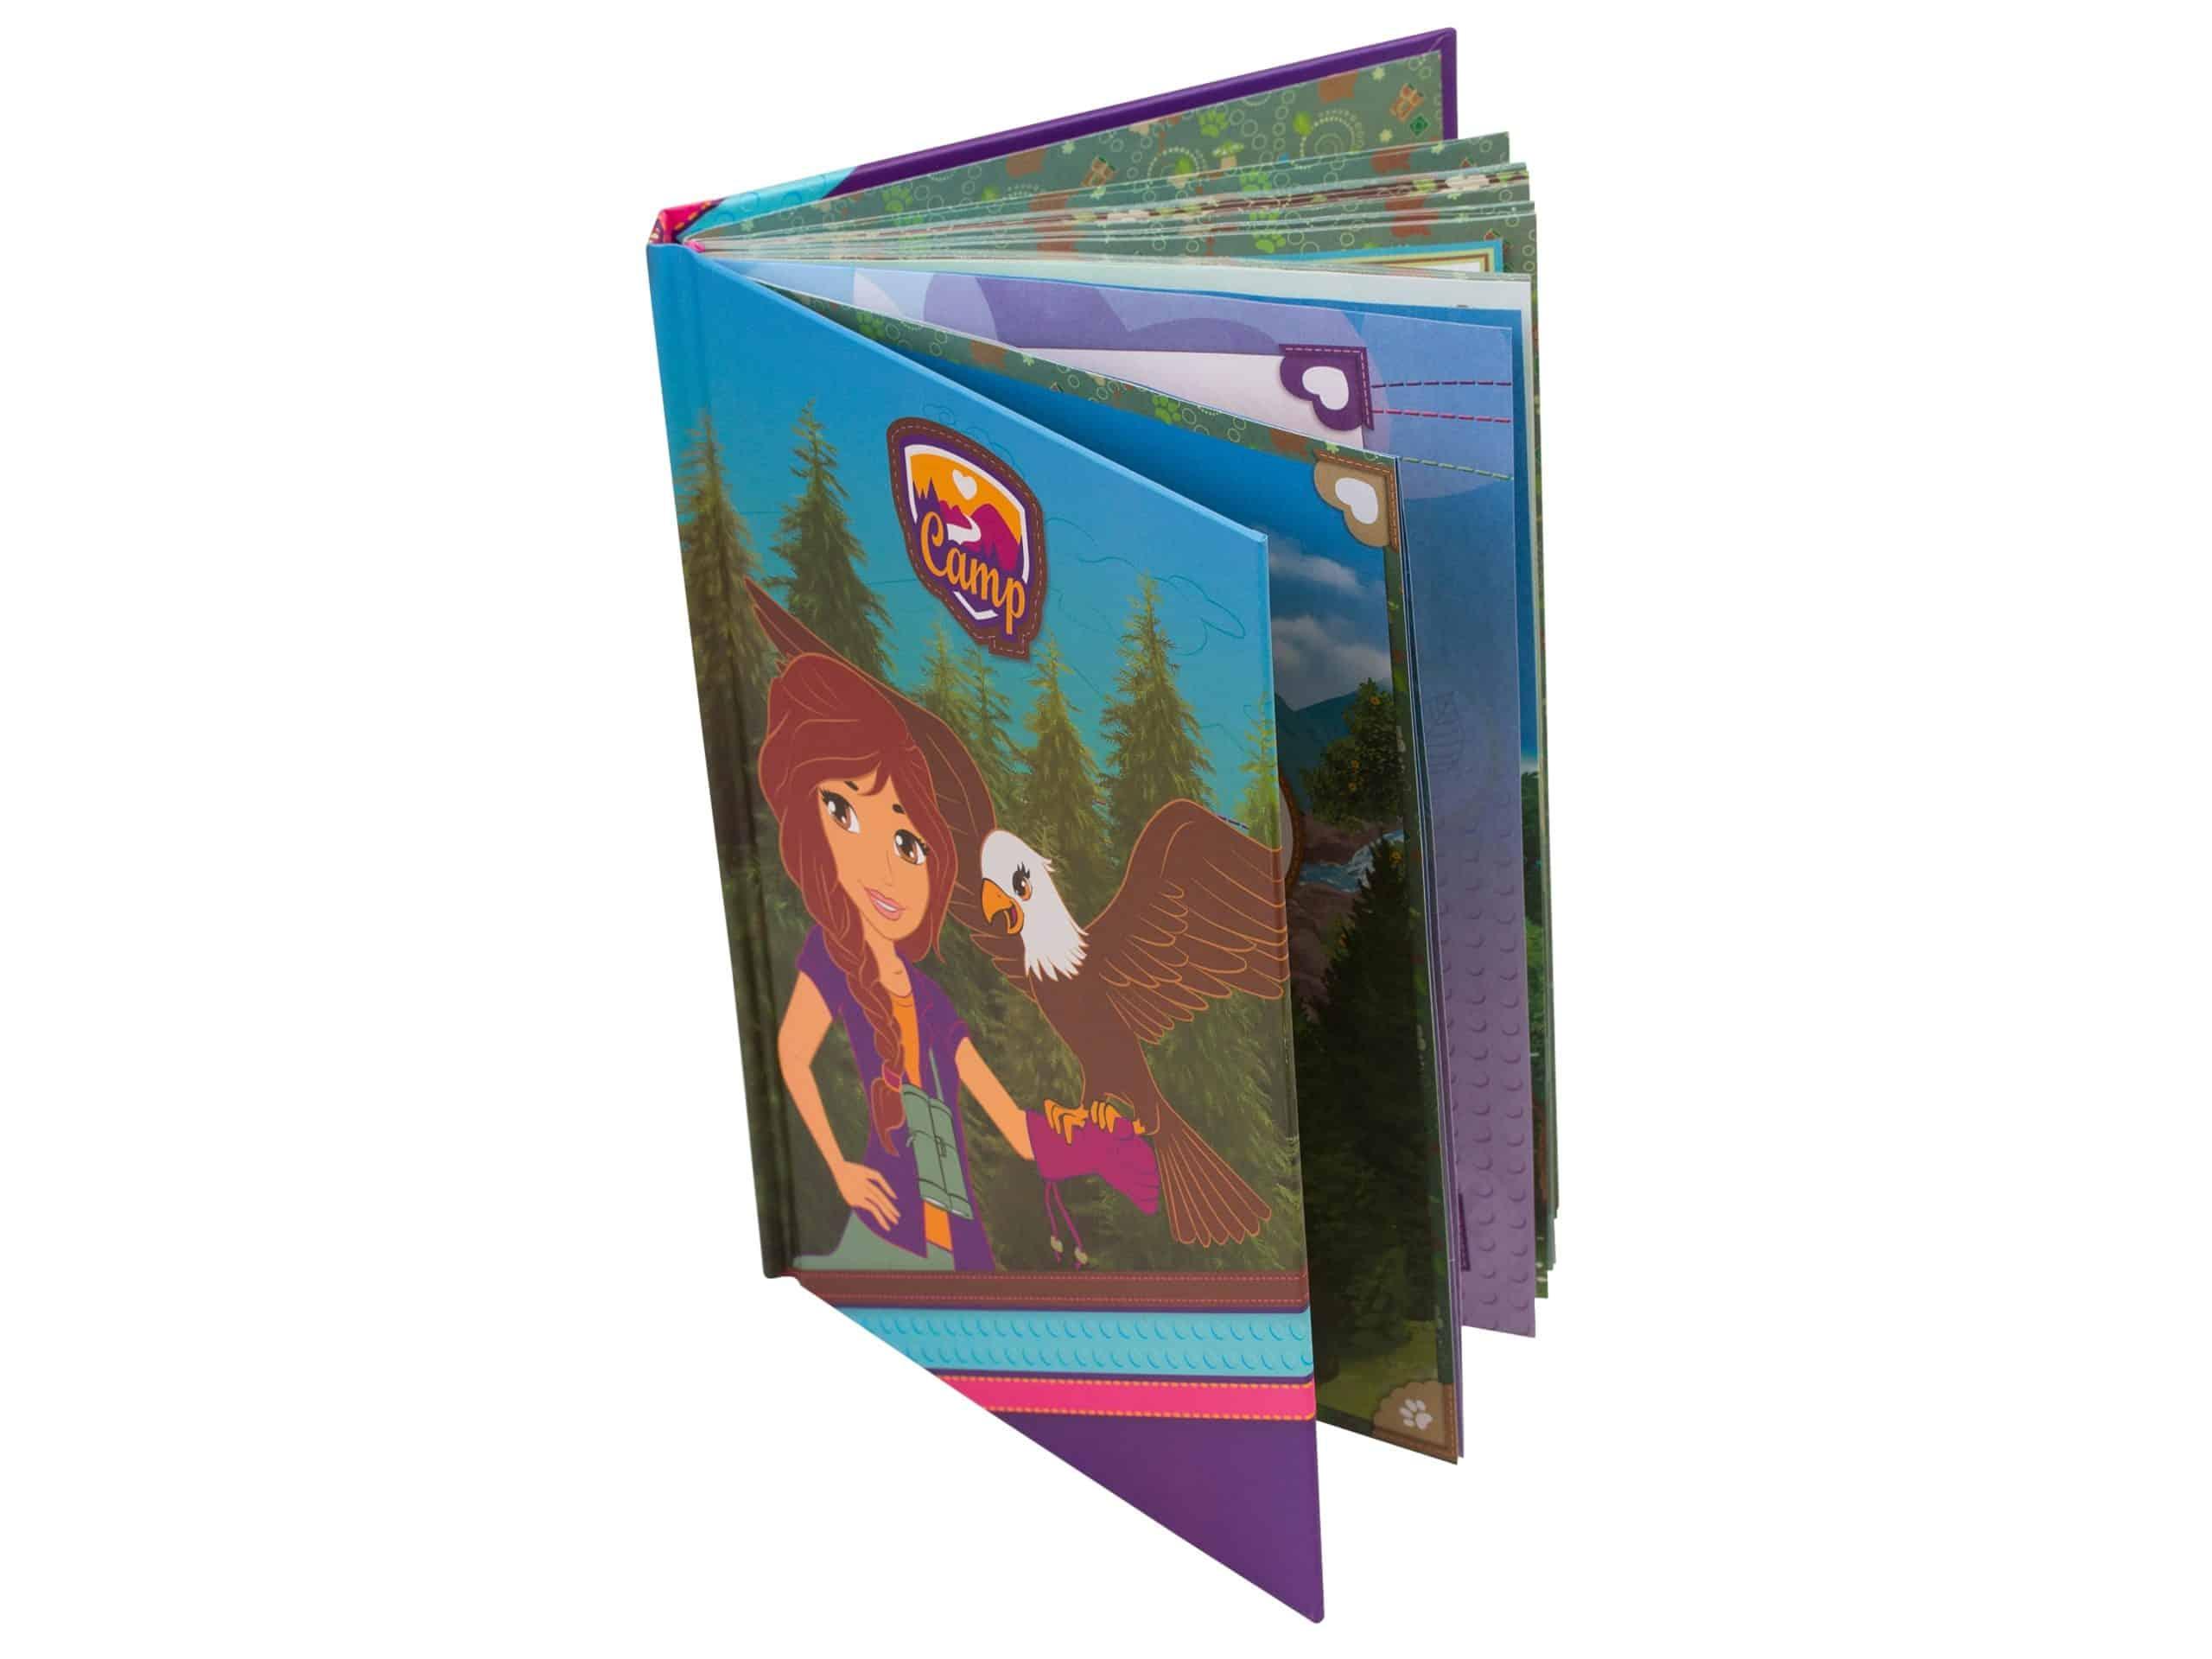 lego 853555 album de camping friends scaled